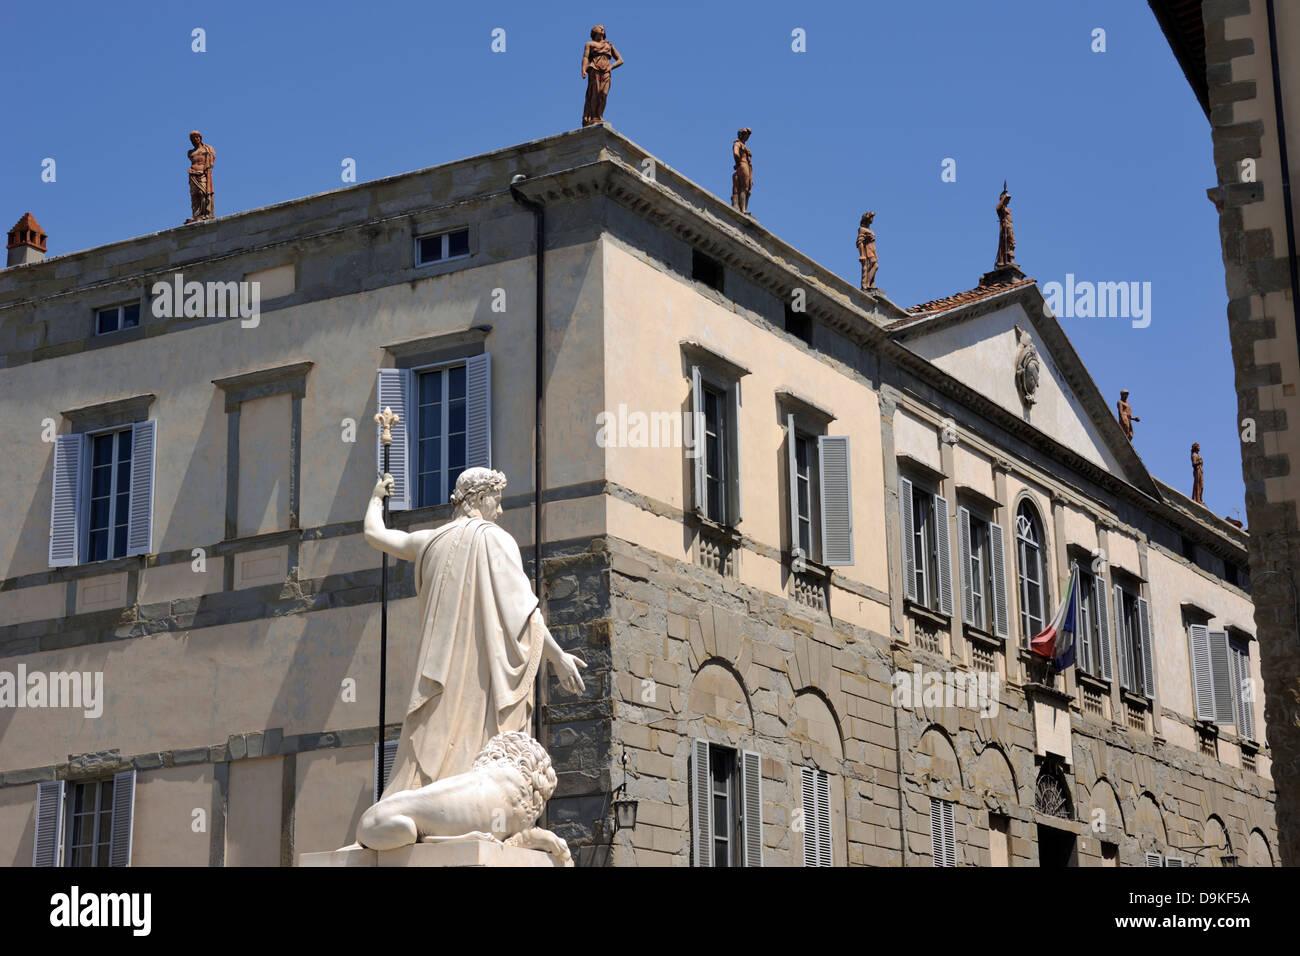 italy, tuscany, arezzo, palazzo albergotti, also known as palazzo delle statue, neoclassic palace - Stock Image